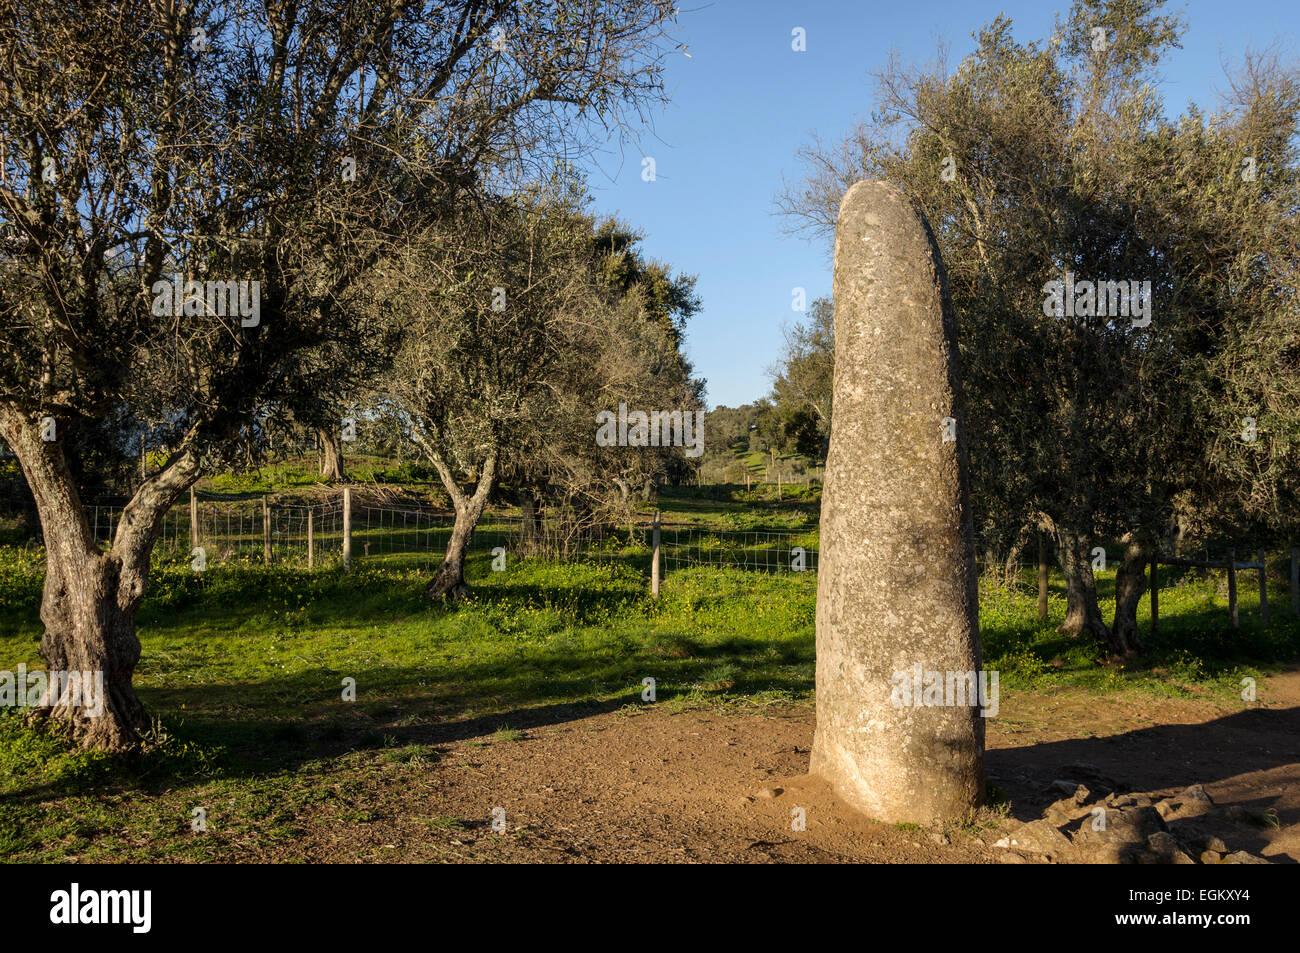 Menir dos Almendres, Almendres menhir - Stock Image